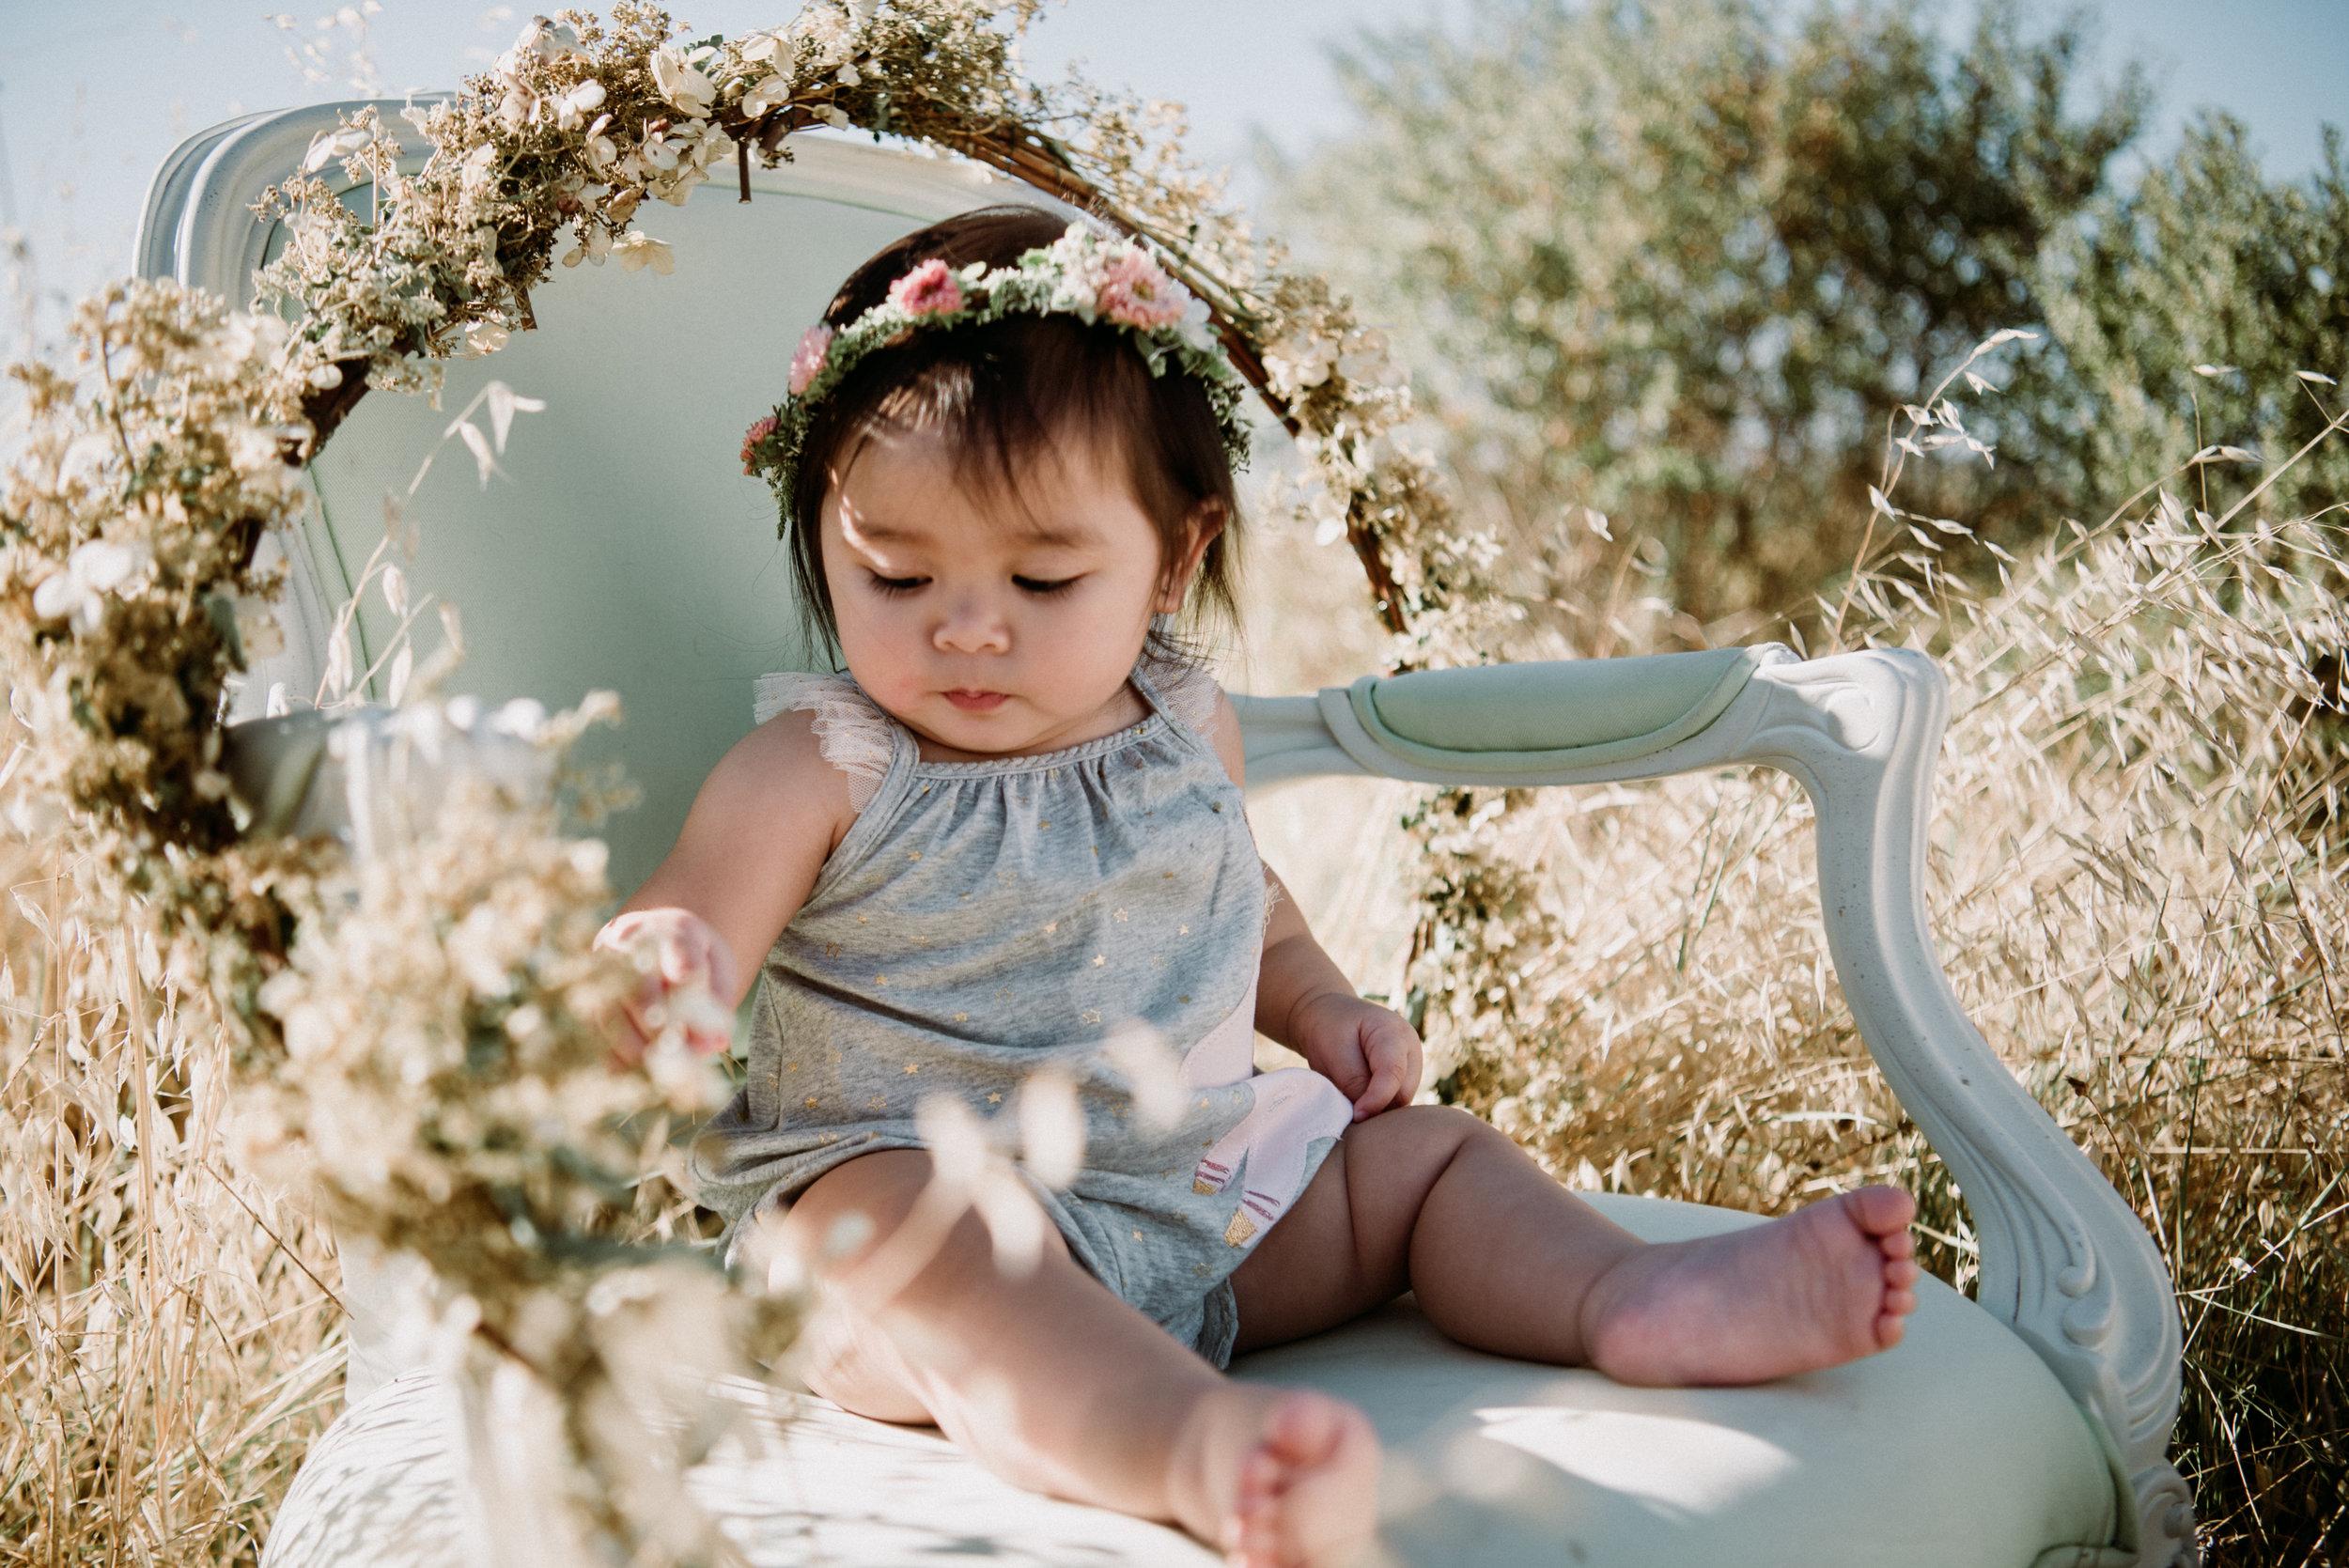 FINAL_Lets_Spread_Beauty_Photography_Landon_Newborn20180903_0024.jpg